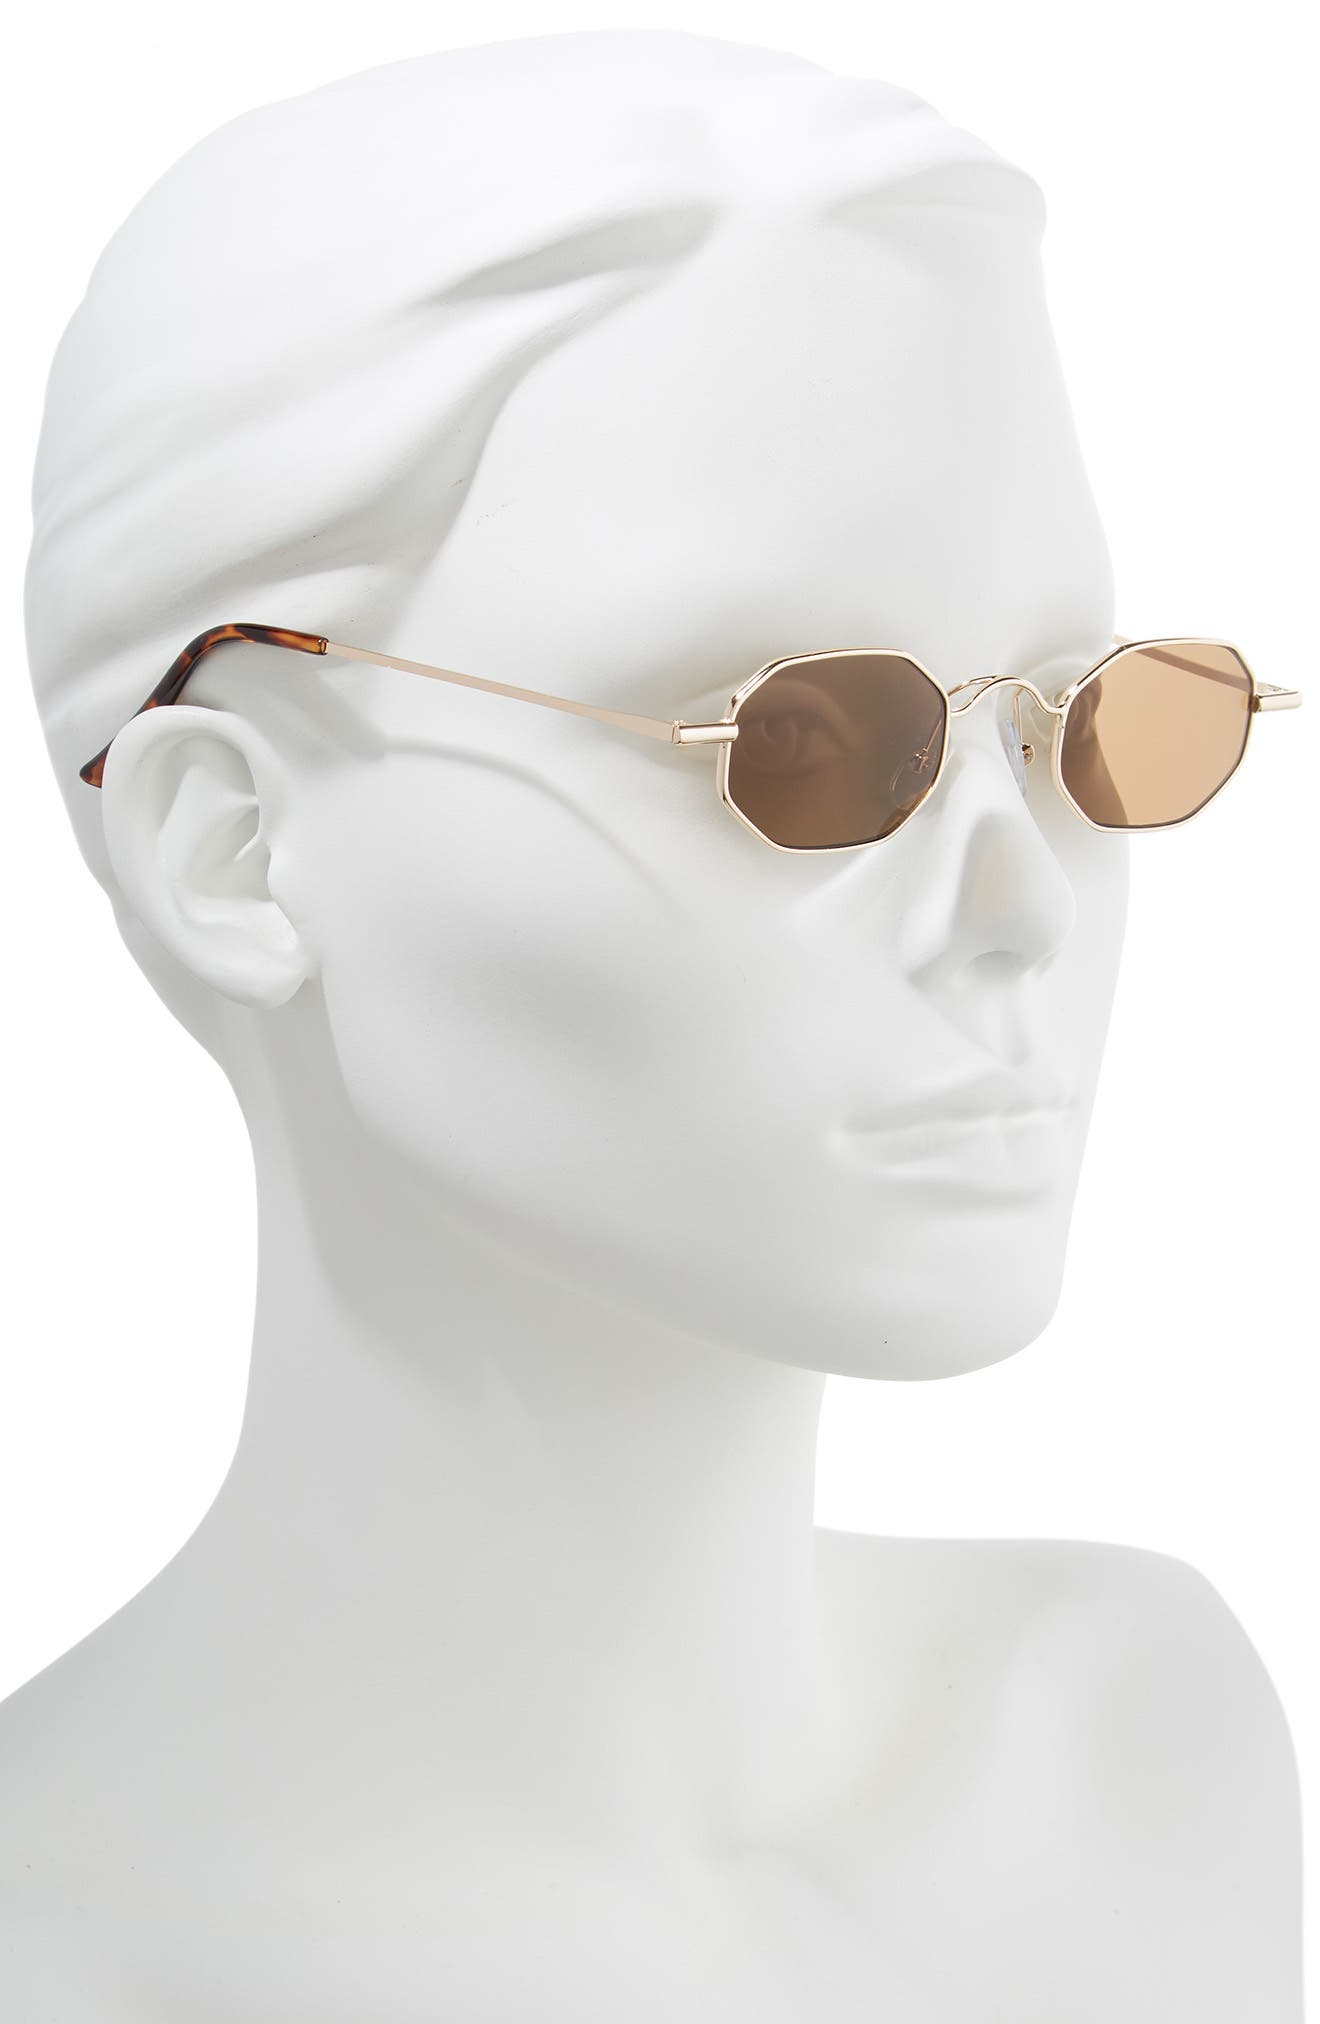 40mm Mini Hexagon Sunglasses,                             Alternate thumbnail 2, color,                             BROWN GOLD